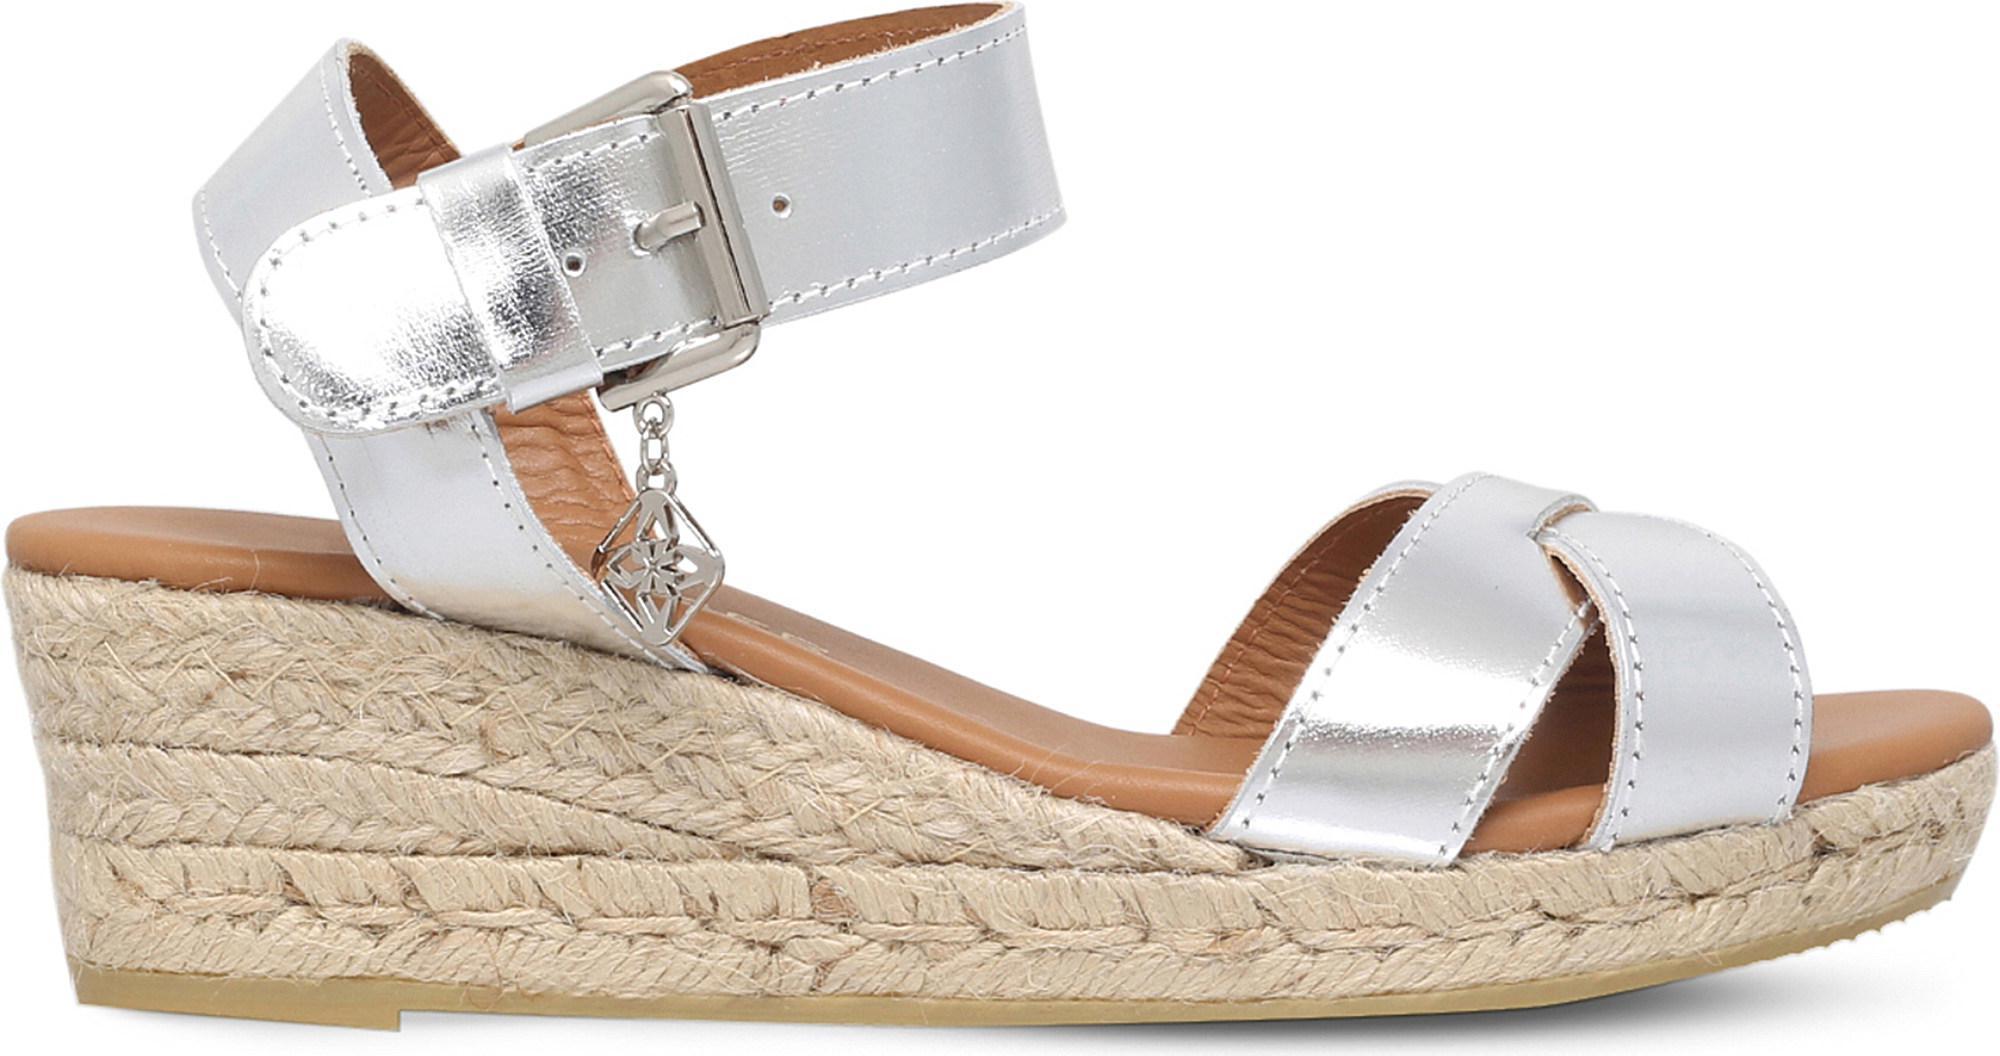 ee246546c42 Kurt Geiger Libby Metallic Leather Wedge Sandals in Metallic - Lyst